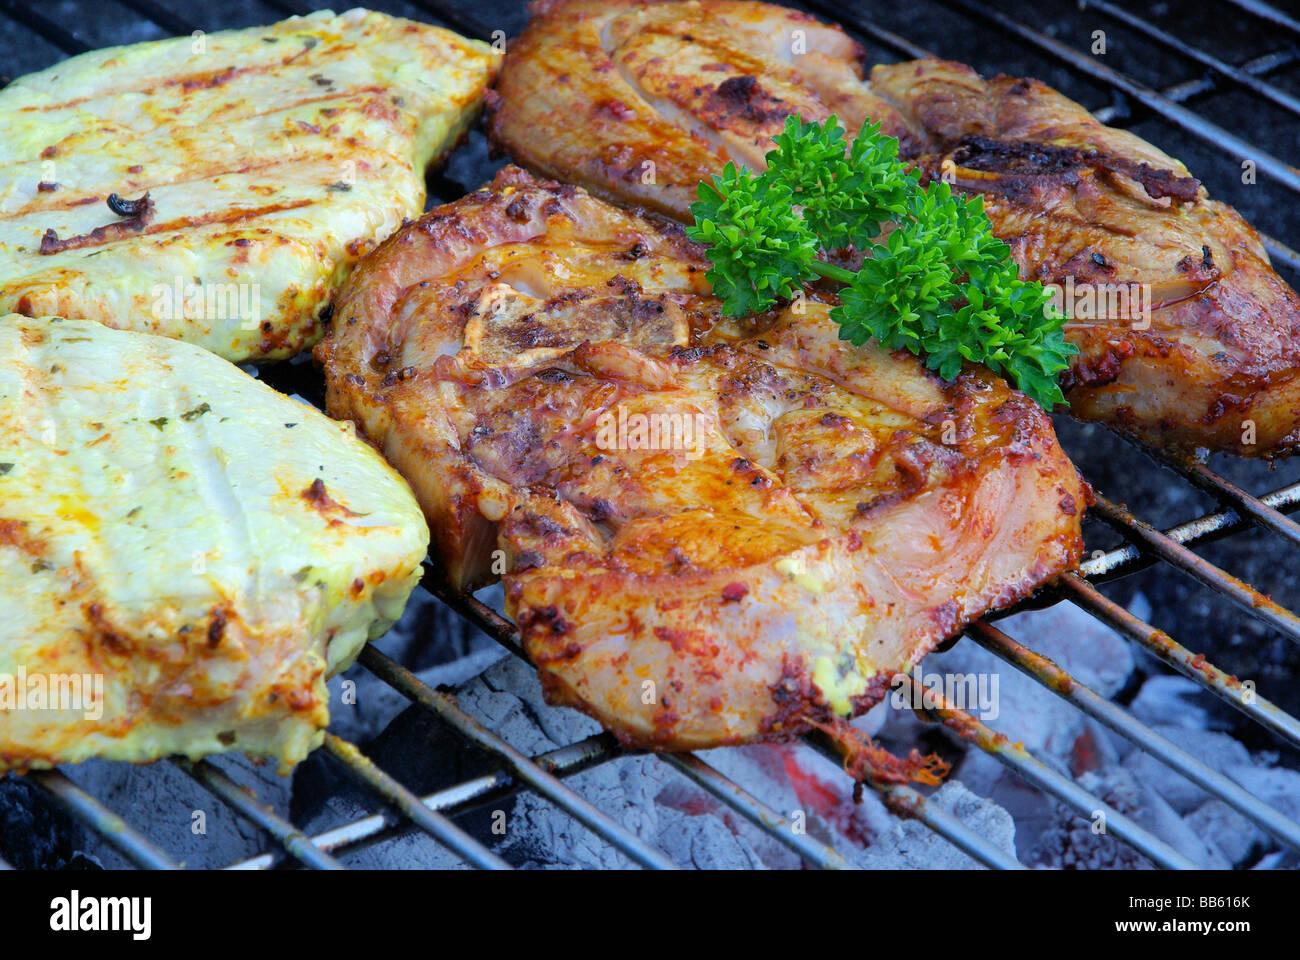 Grillen barbecue 94 Photo Stock